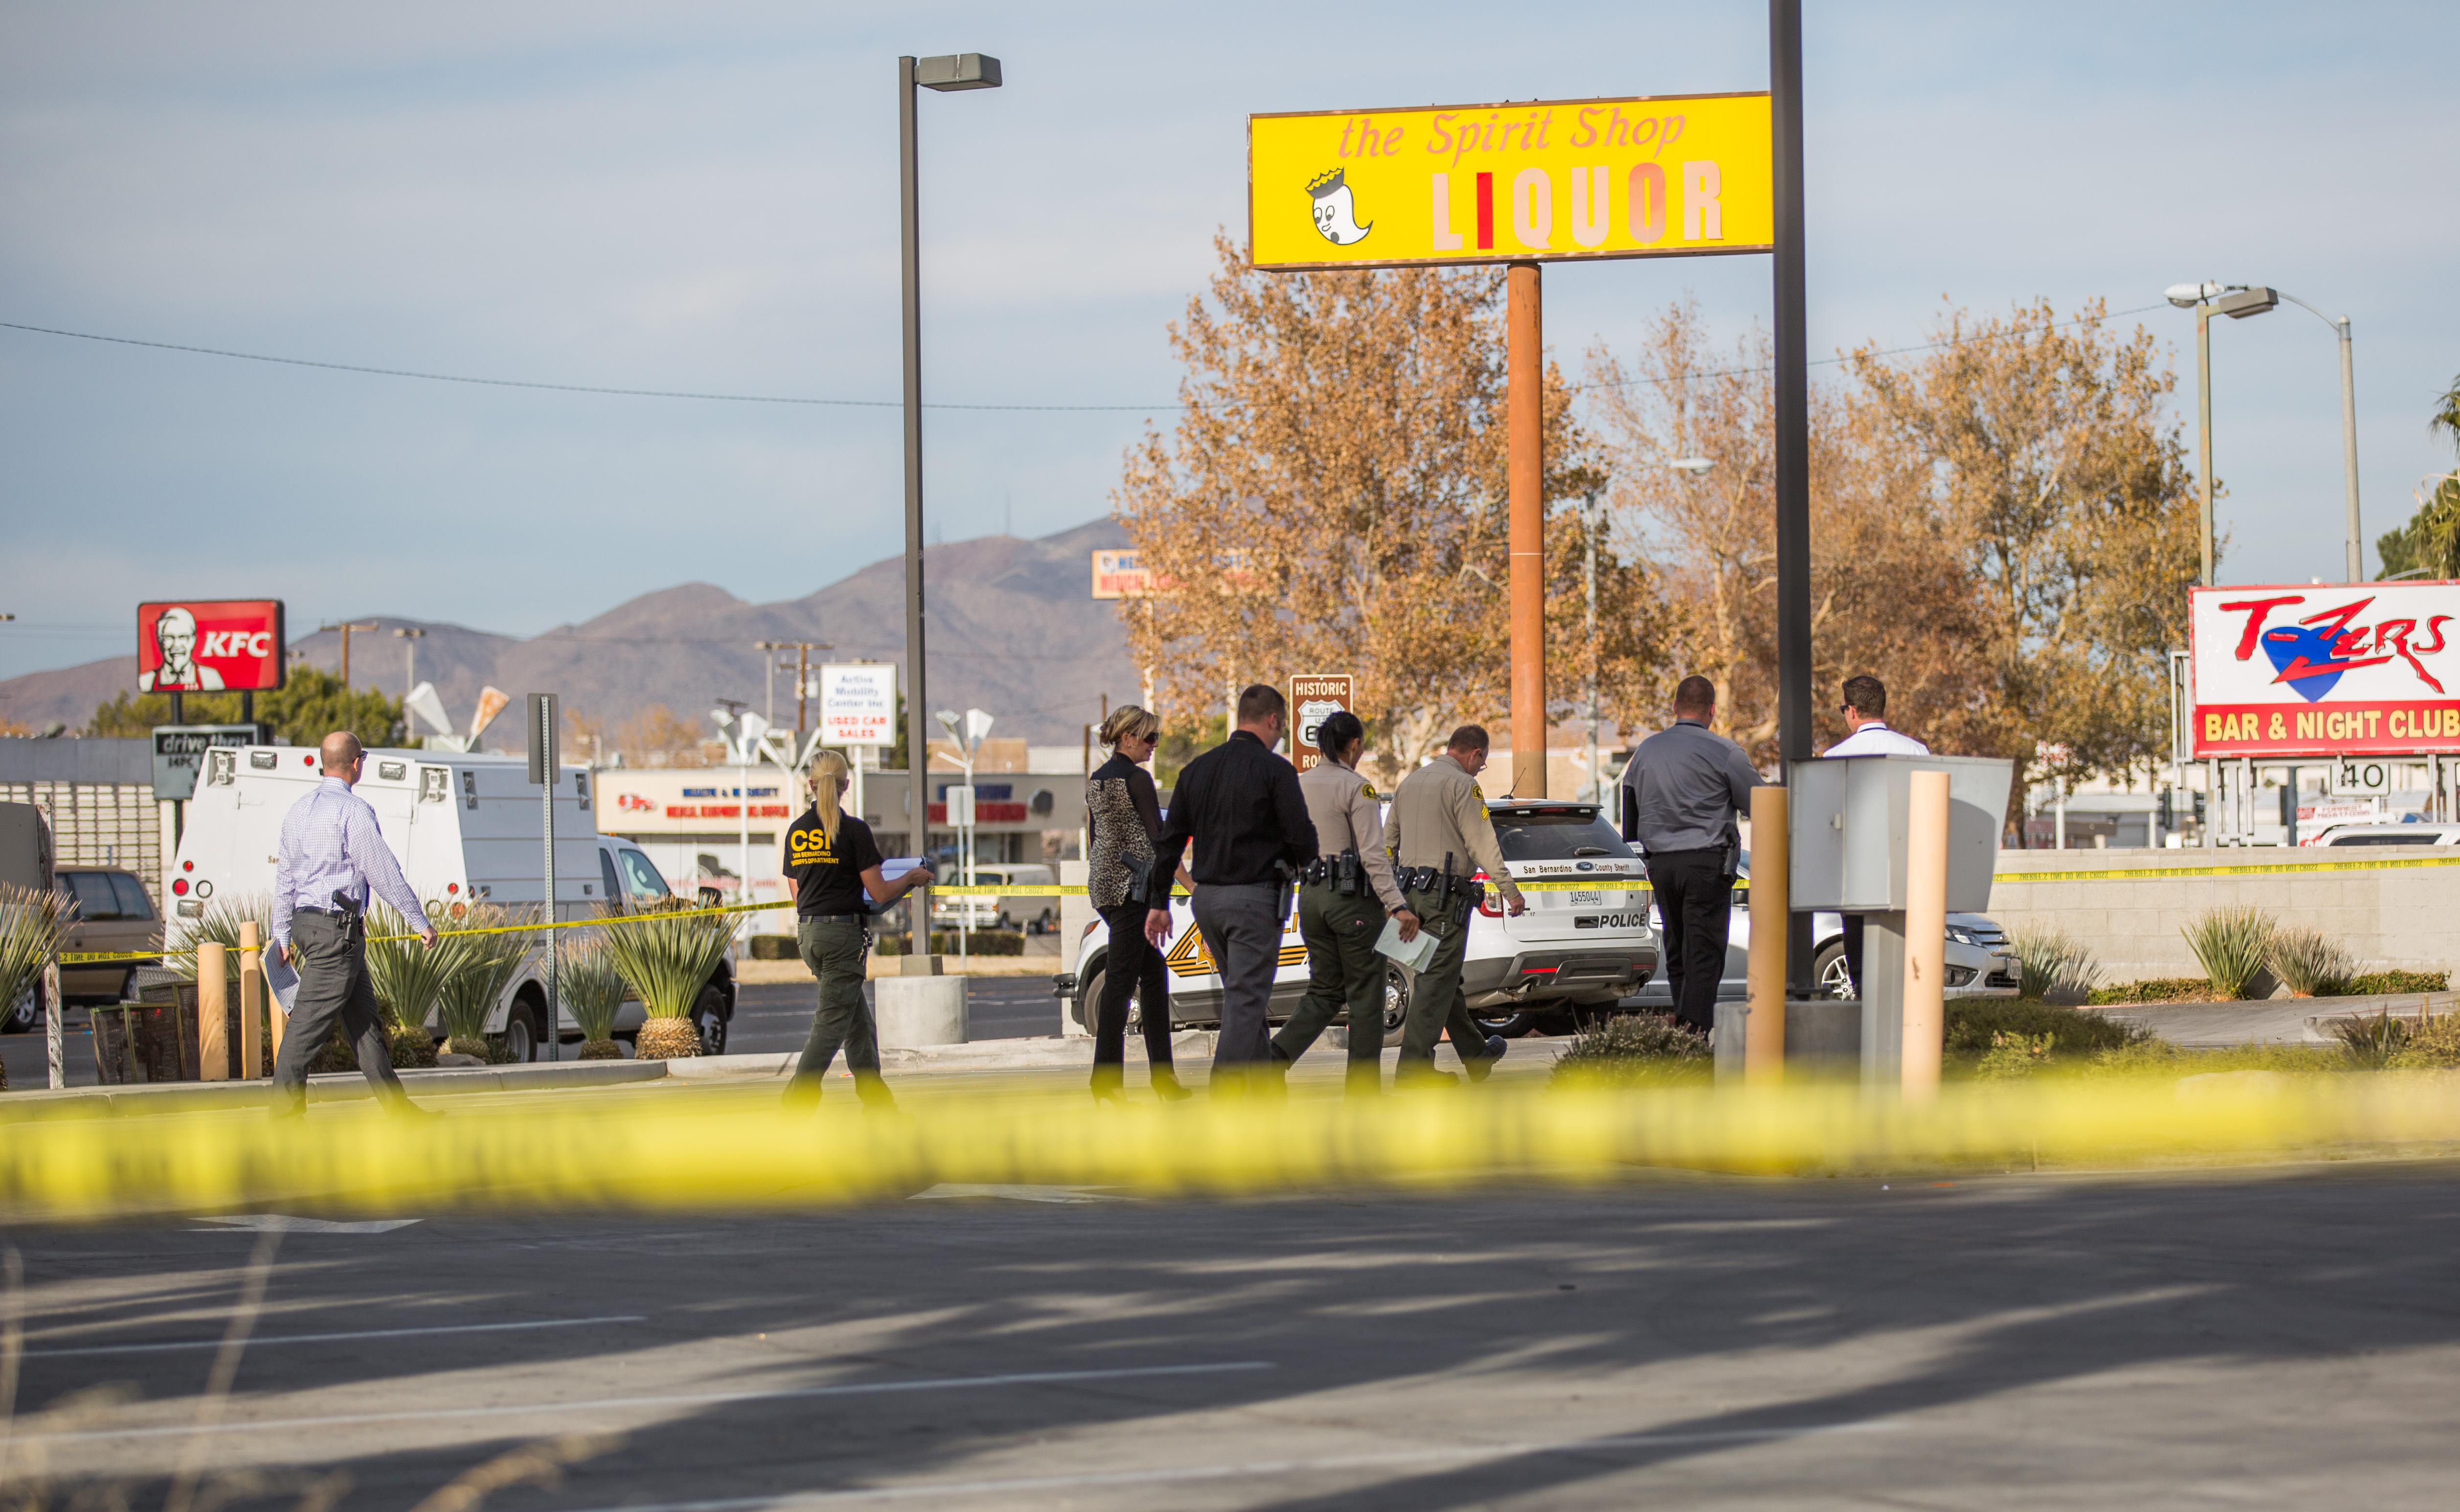 CSI (Crime Scene Investigation) closes off area while investigation body of an newborn baby located in Victorville. (Gabriel D. Espinoza, Victor Valley News)